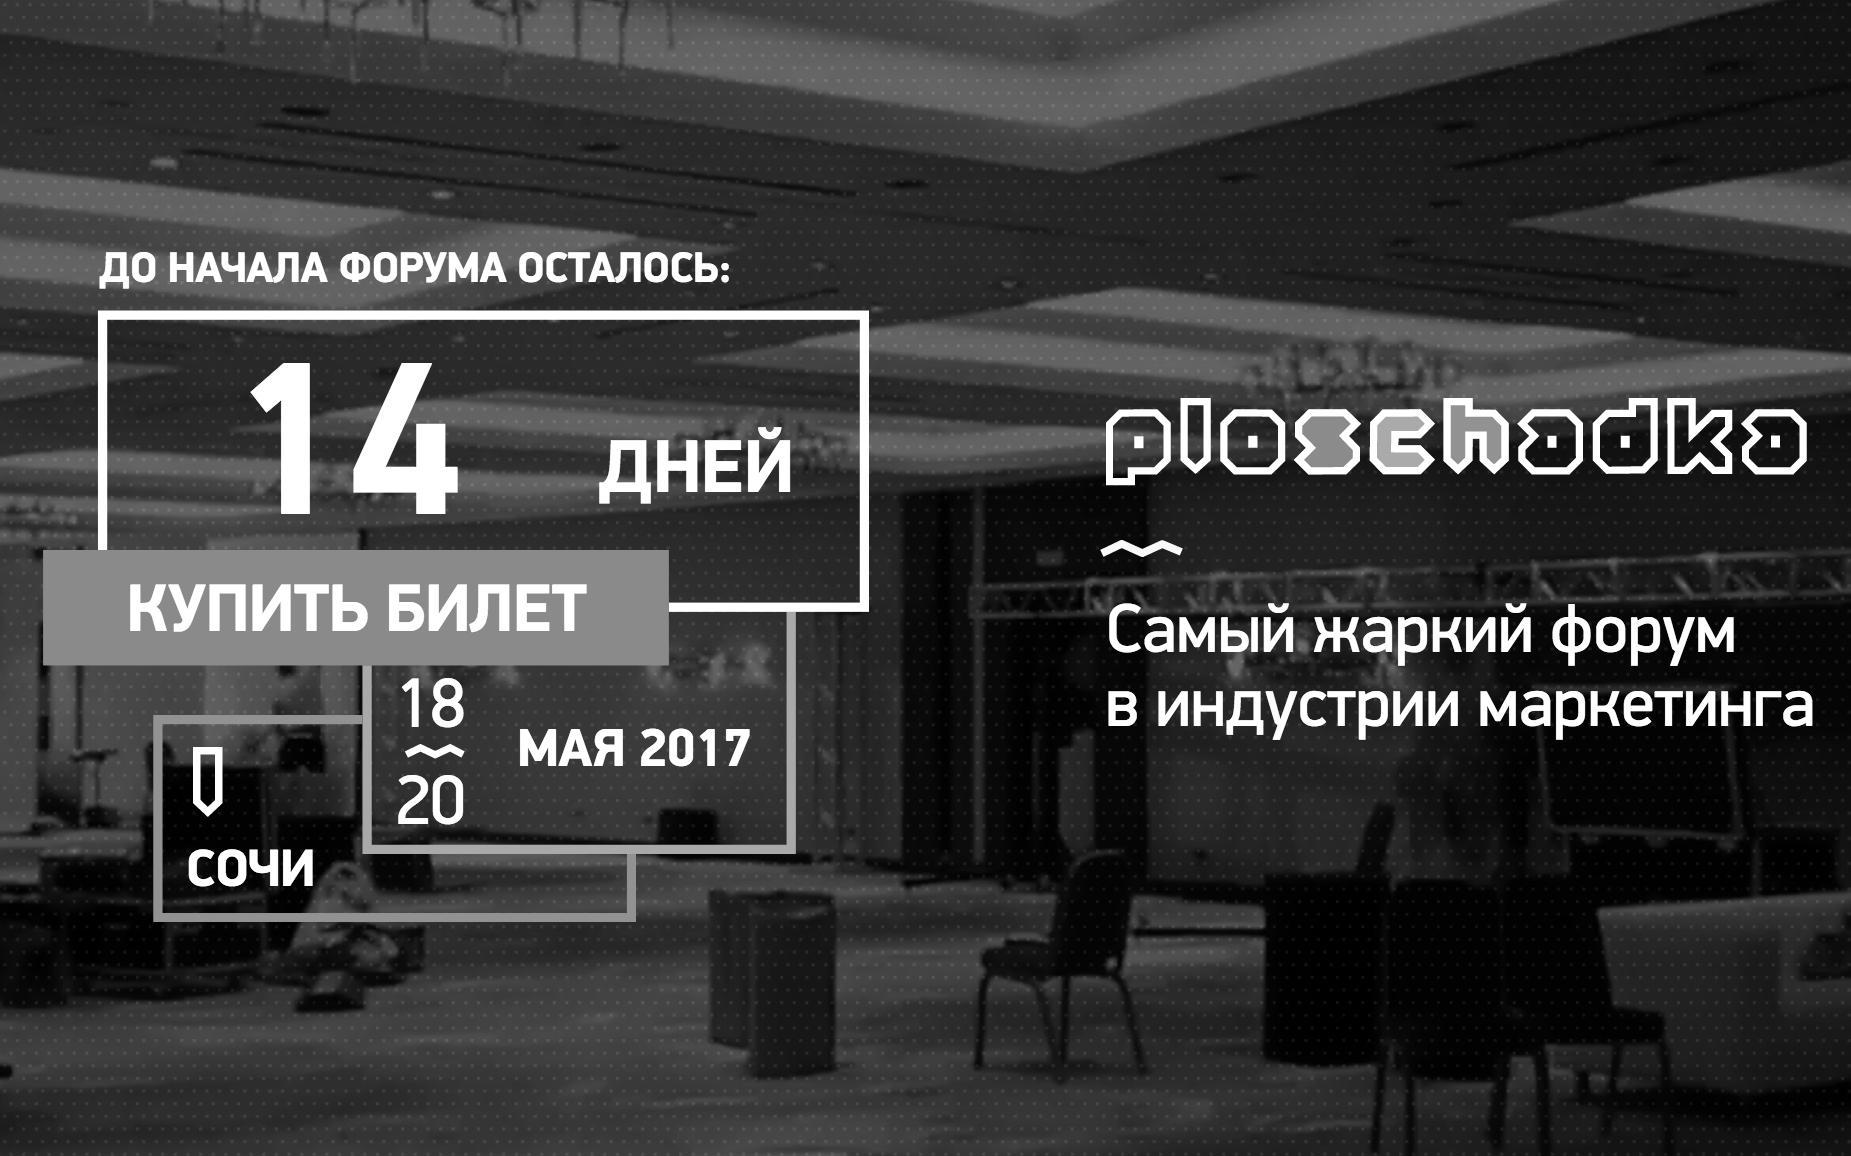 форум креативной индустрии Ploschadka